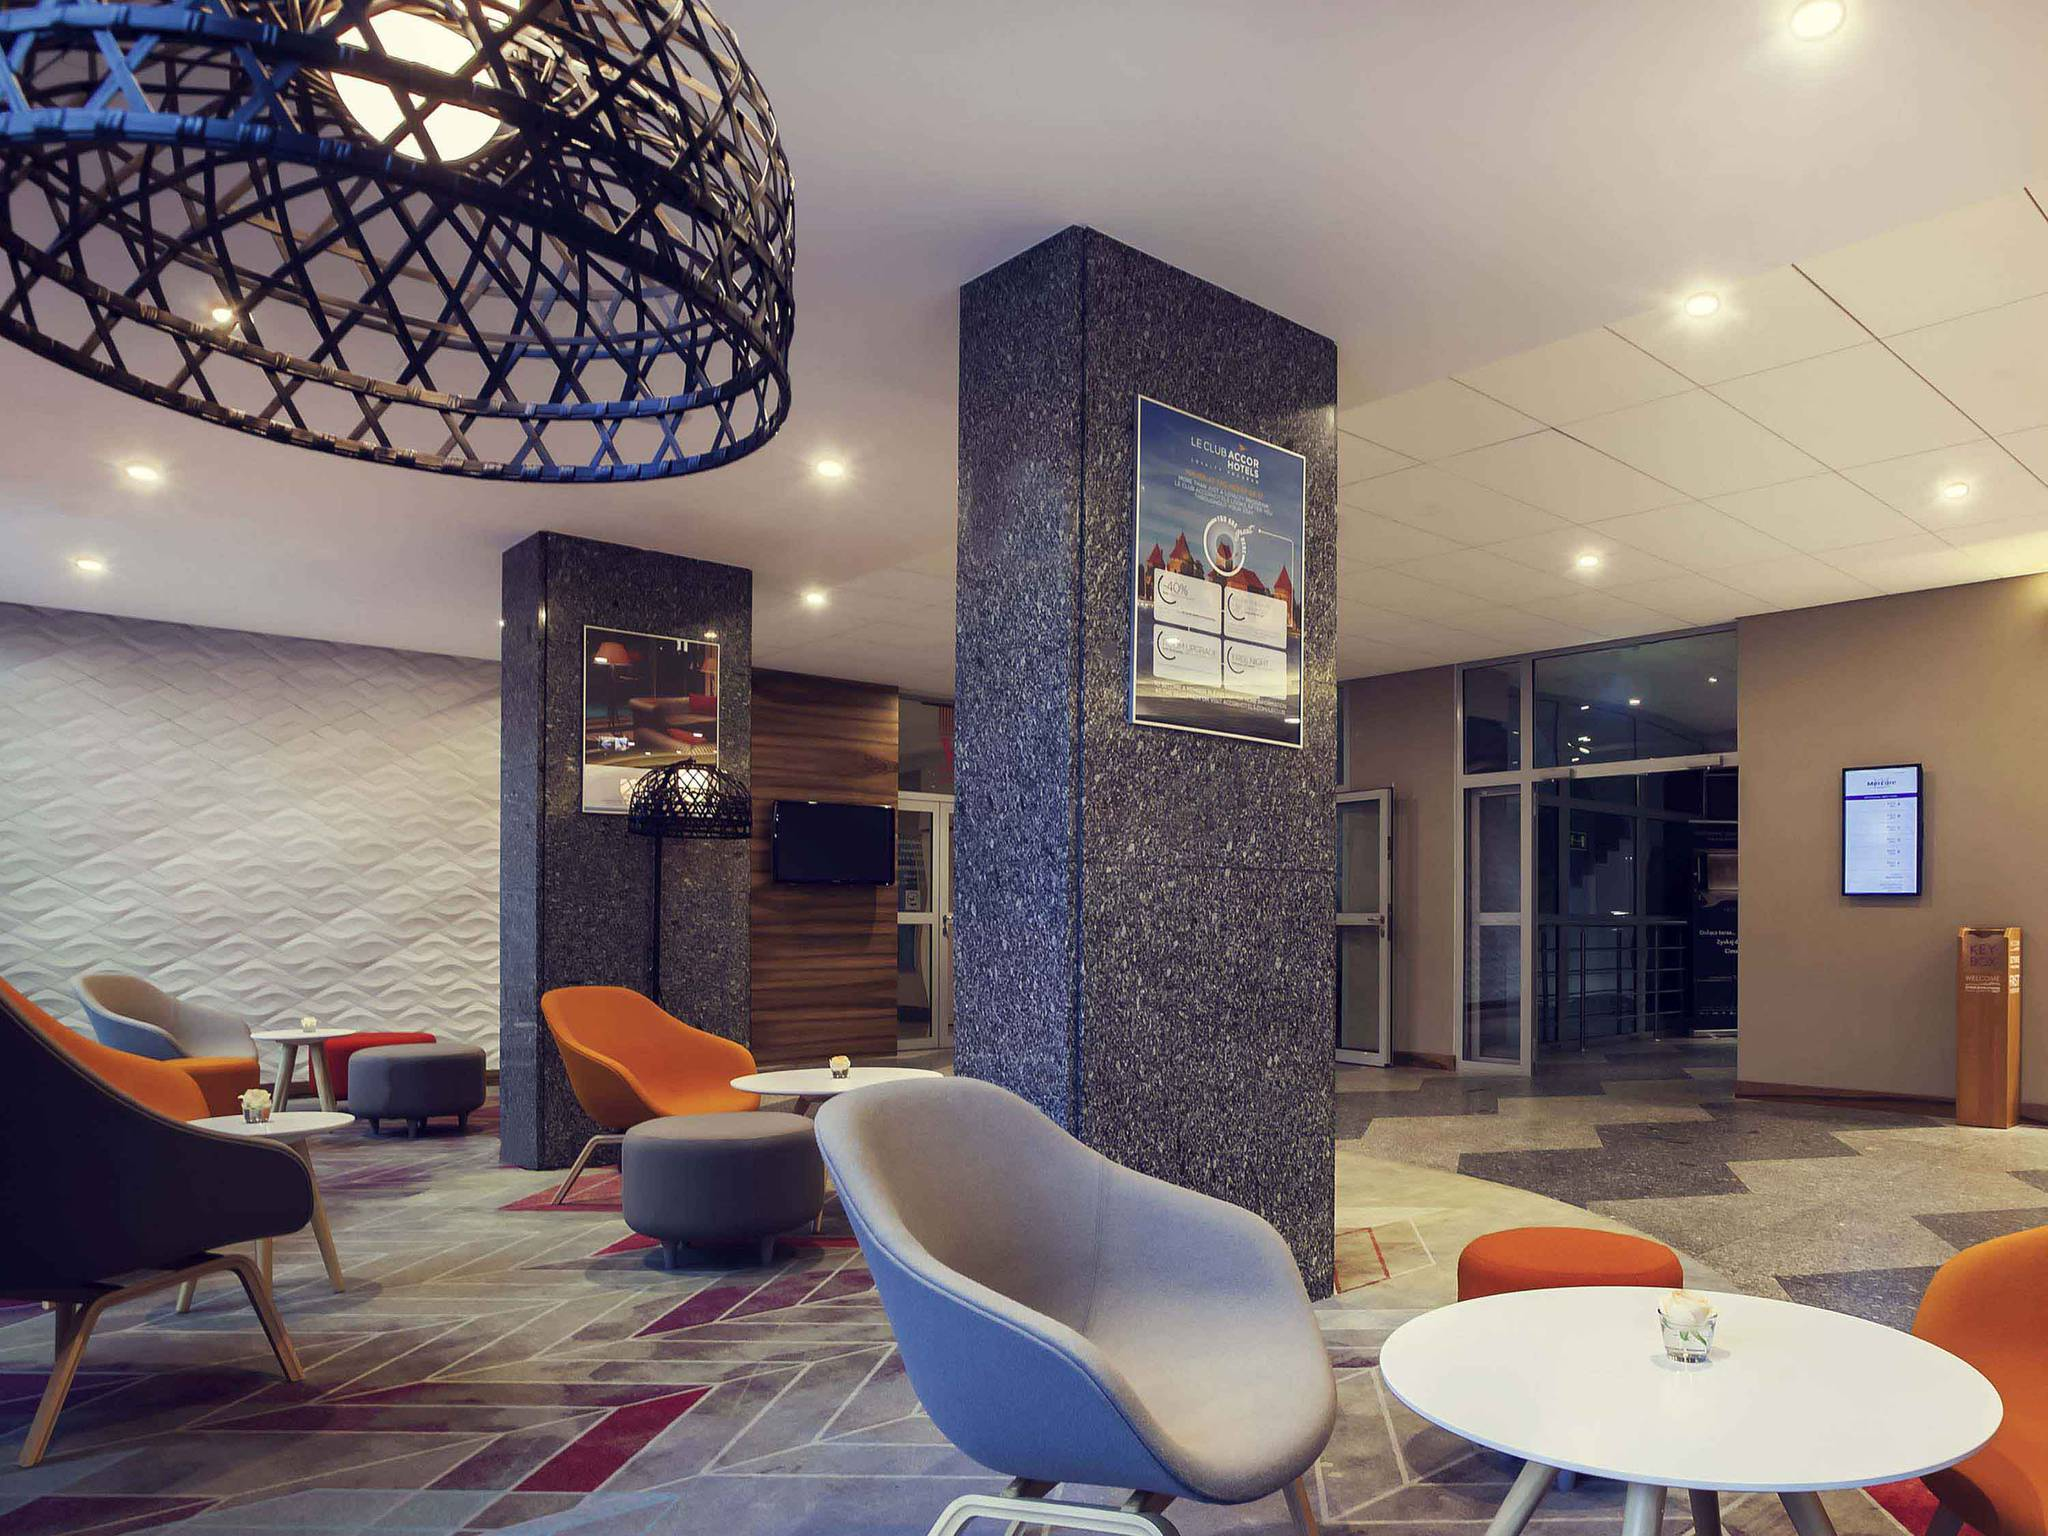 Hotell – Hotel Mercure Czestochowa Centrum